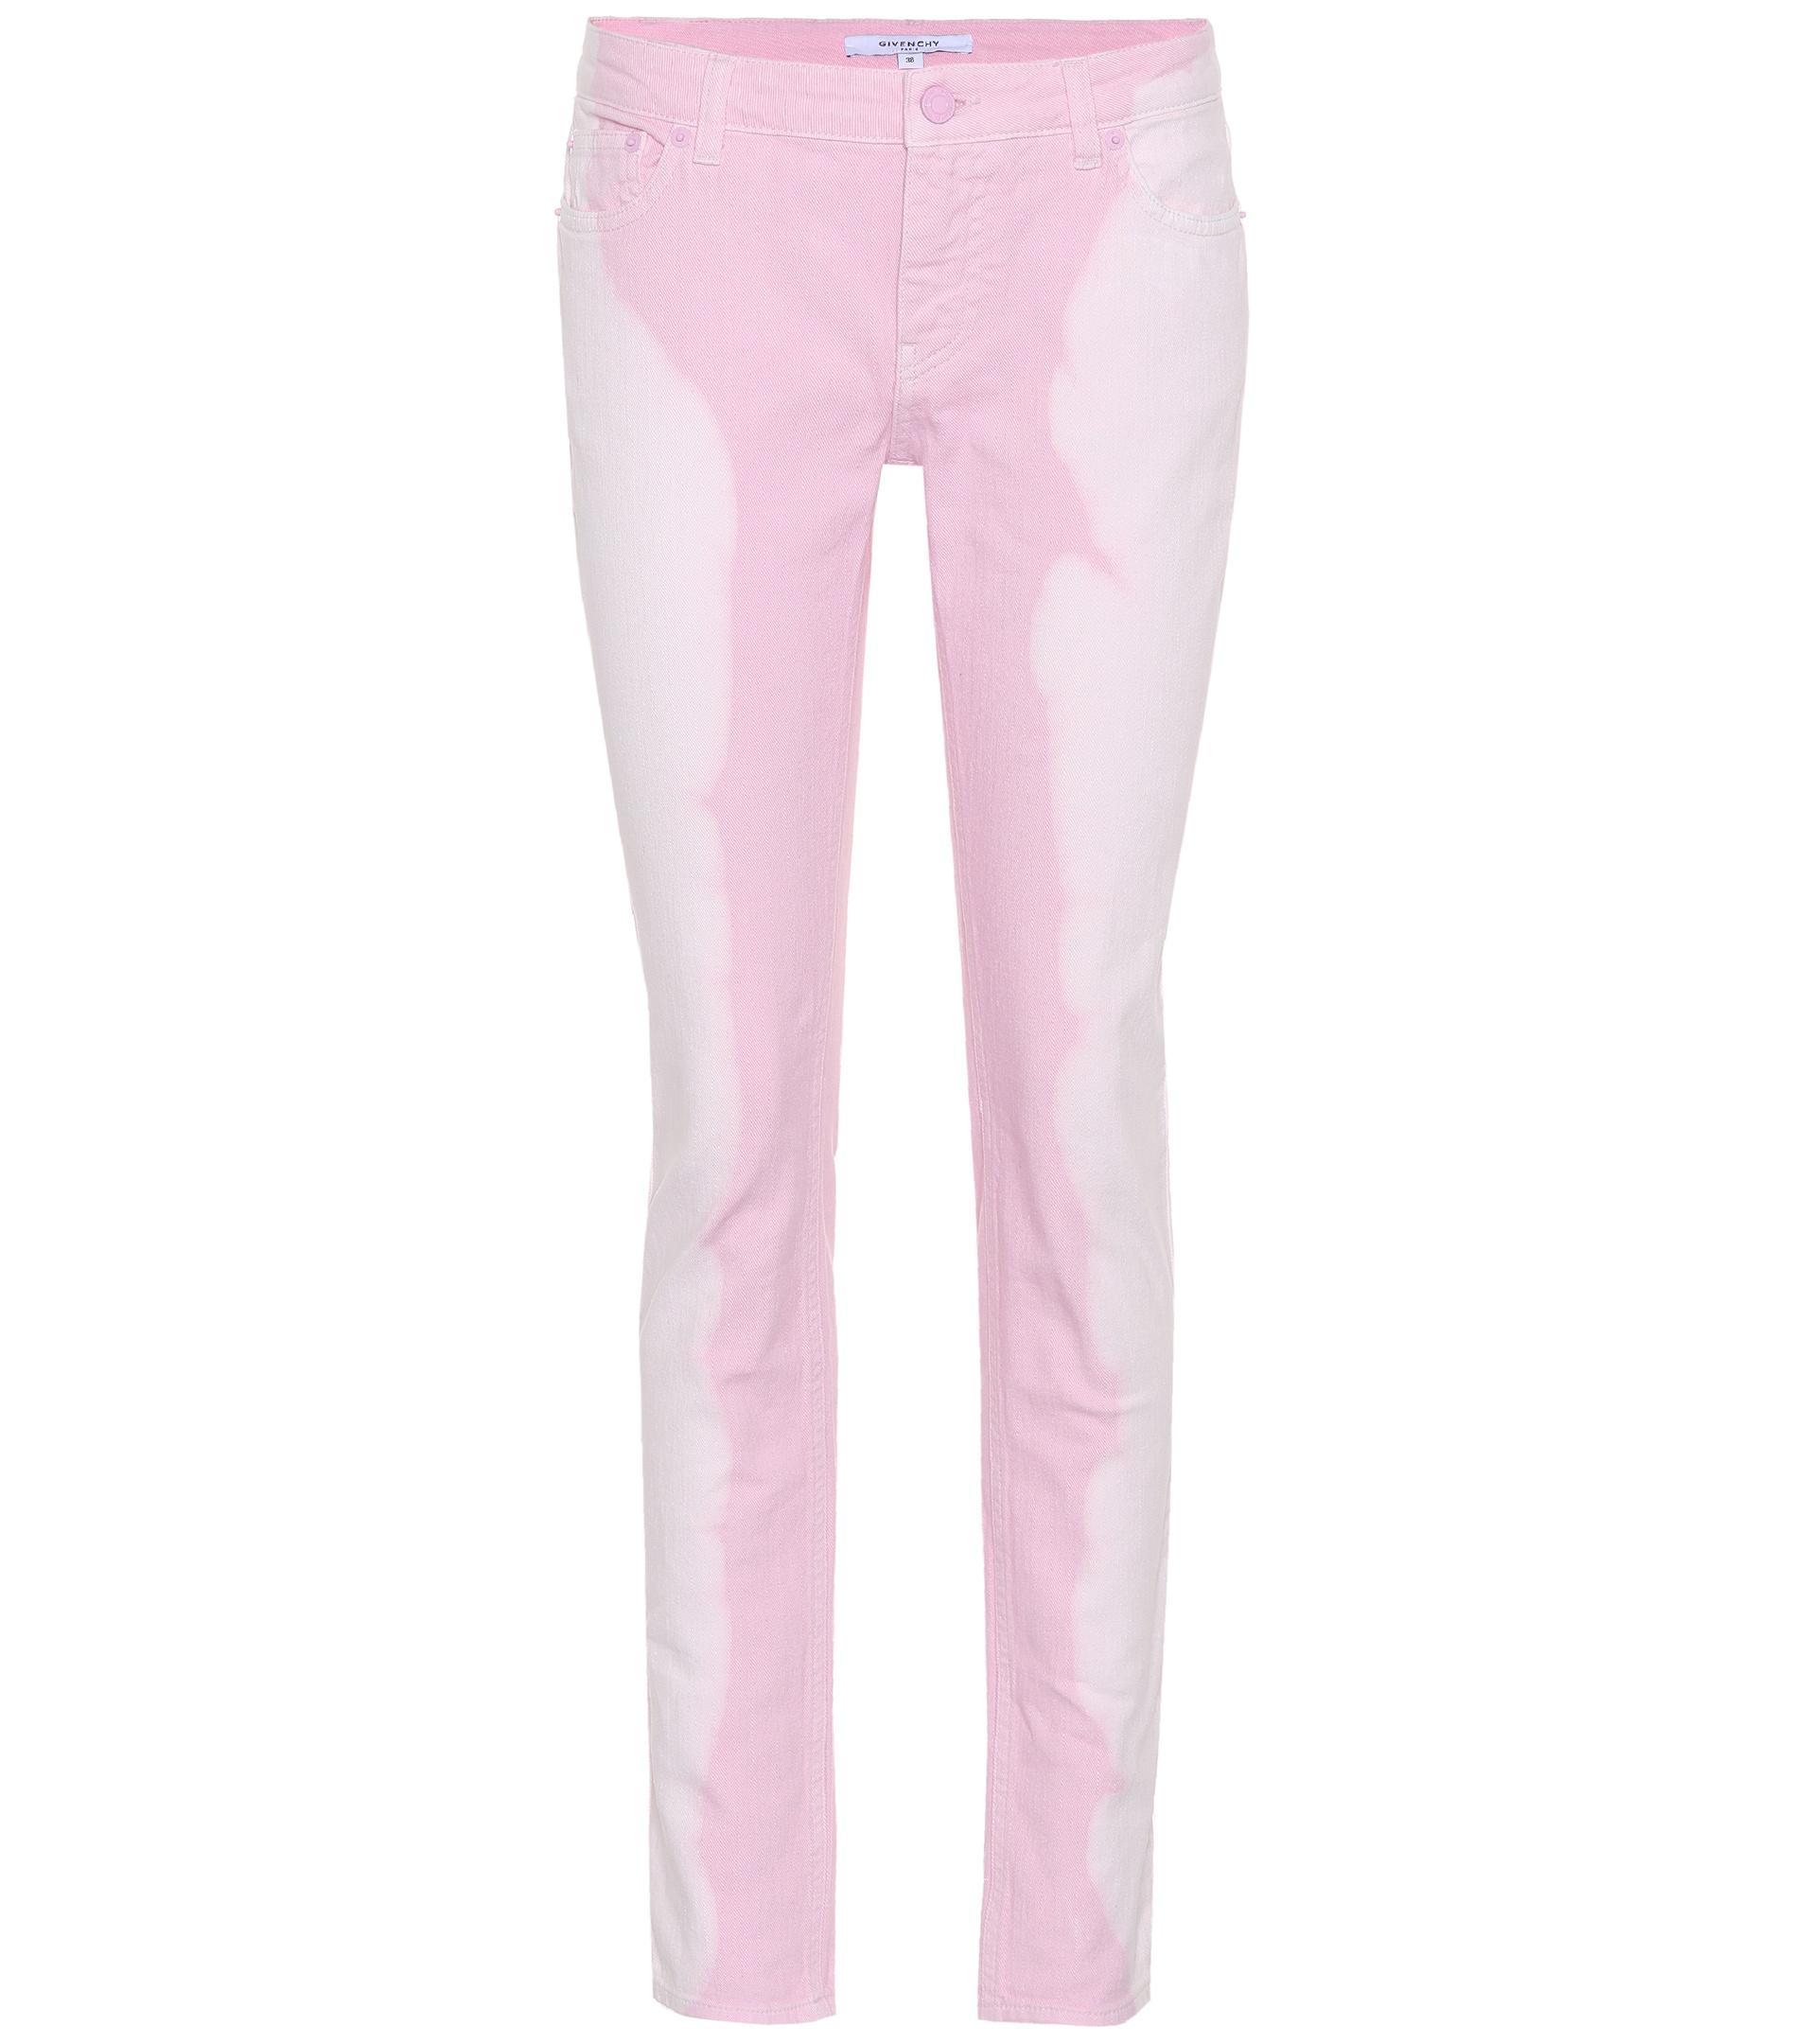 e352401d6bf Lyst - Jeans skinny de tiro bajo Givenchy de color Rosa